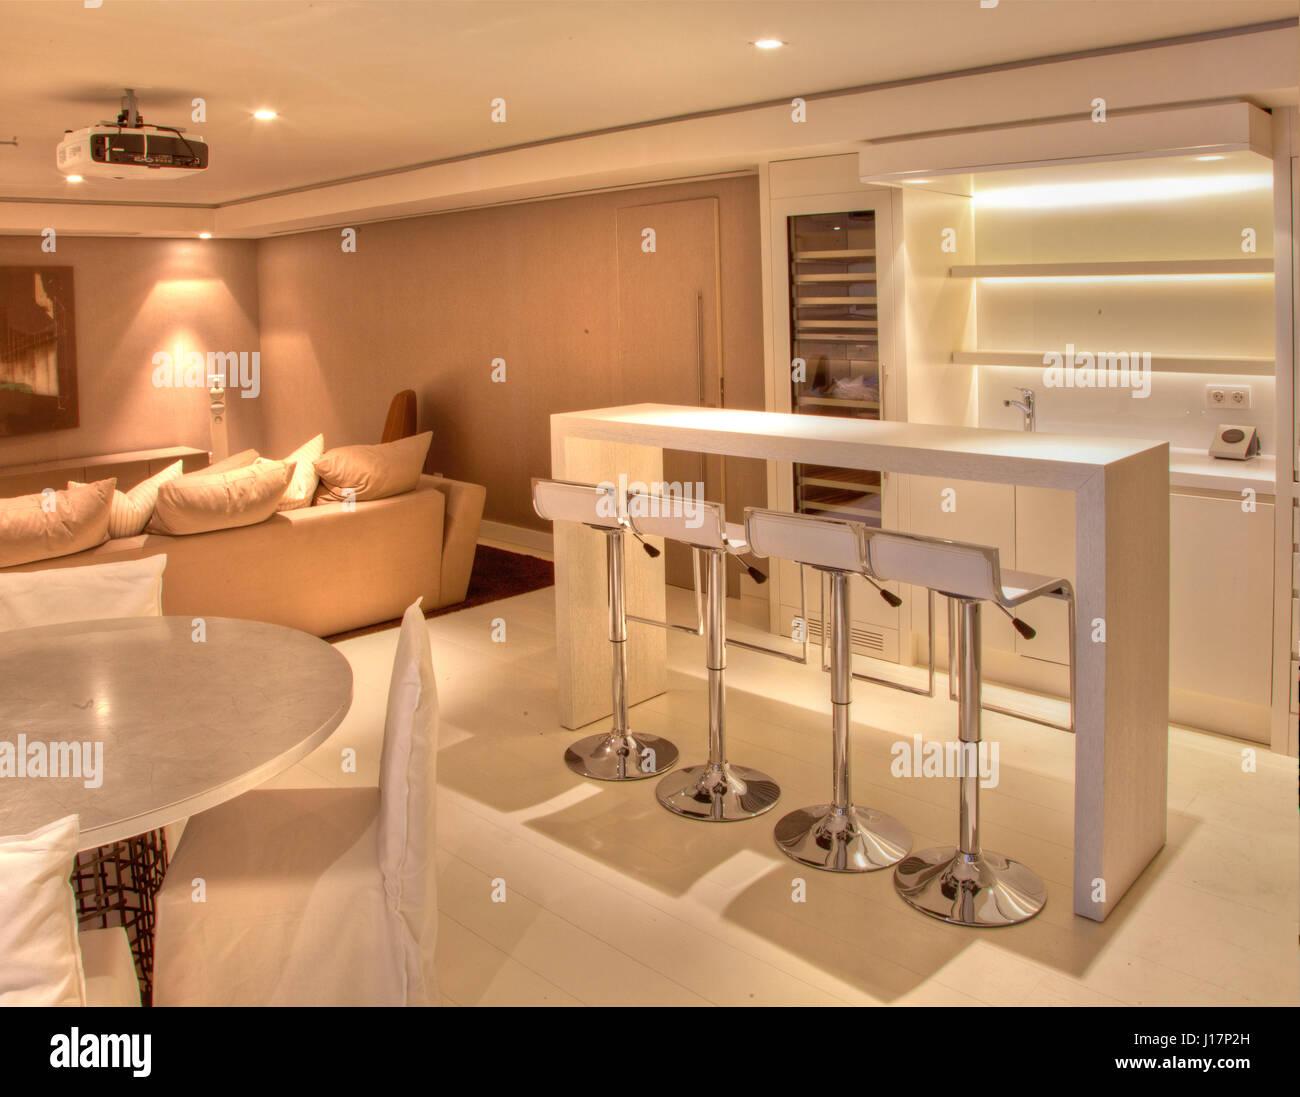 Hermosa Y Moderna Casa Con Luces Indirectas Foto Imagen De Stock - Luces-indirectas